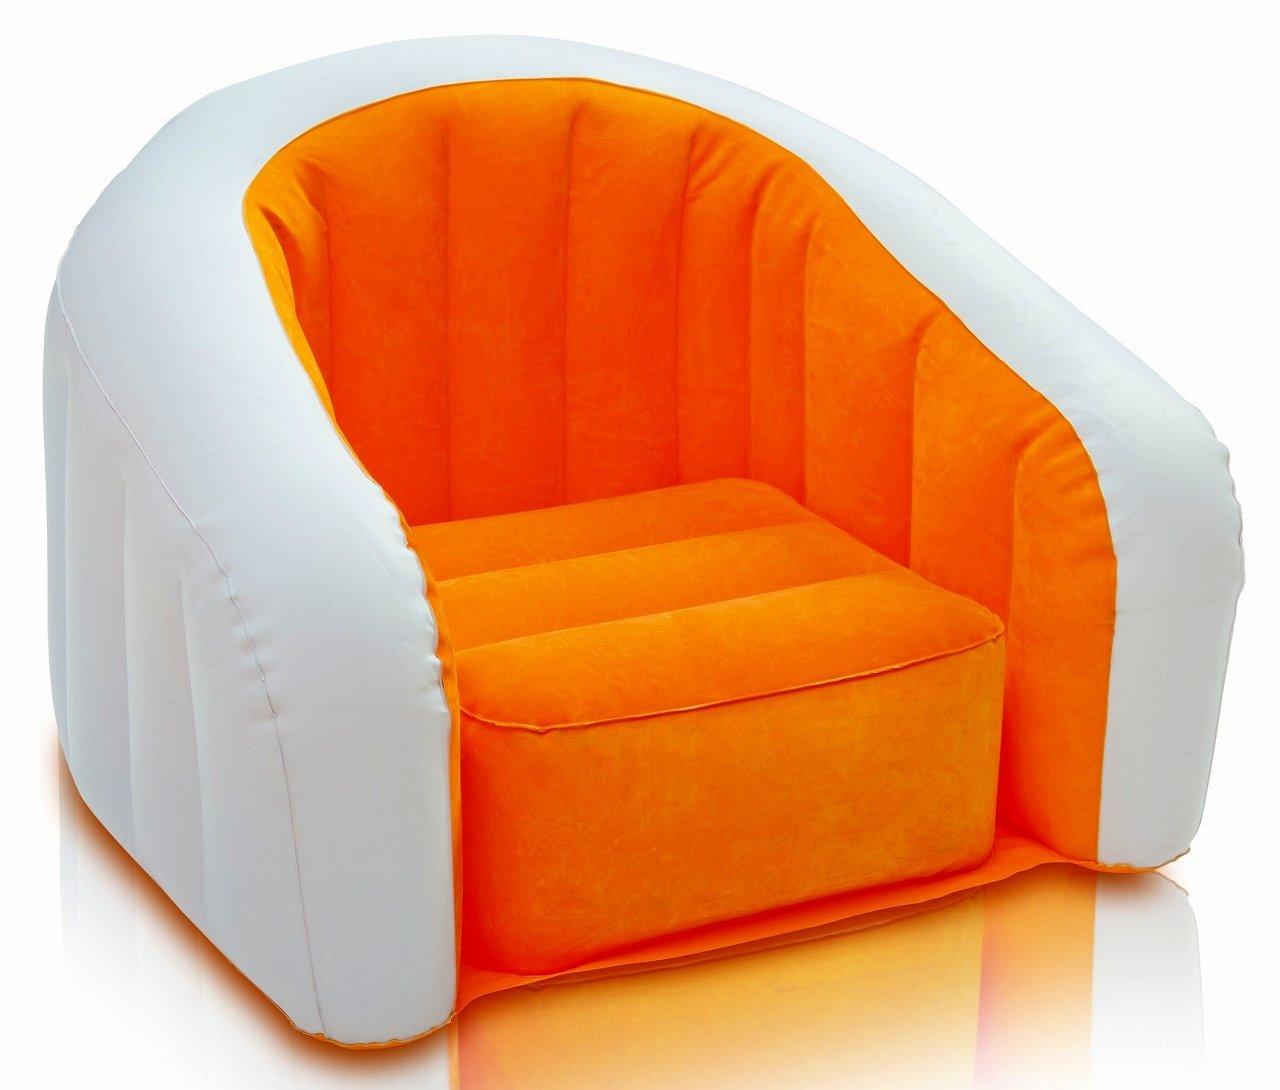 Кресло IntexМатрасы надувные<br>Тип: кресло,<br>Назначение: для дома и офиса,<br>Размеры: 690х560х480,<br>Длина (мм): 690,<br>Ширина: 560,<br>Высота: 480,<br>Цвет: оранжевый,<br>Количество мест: 1<br>